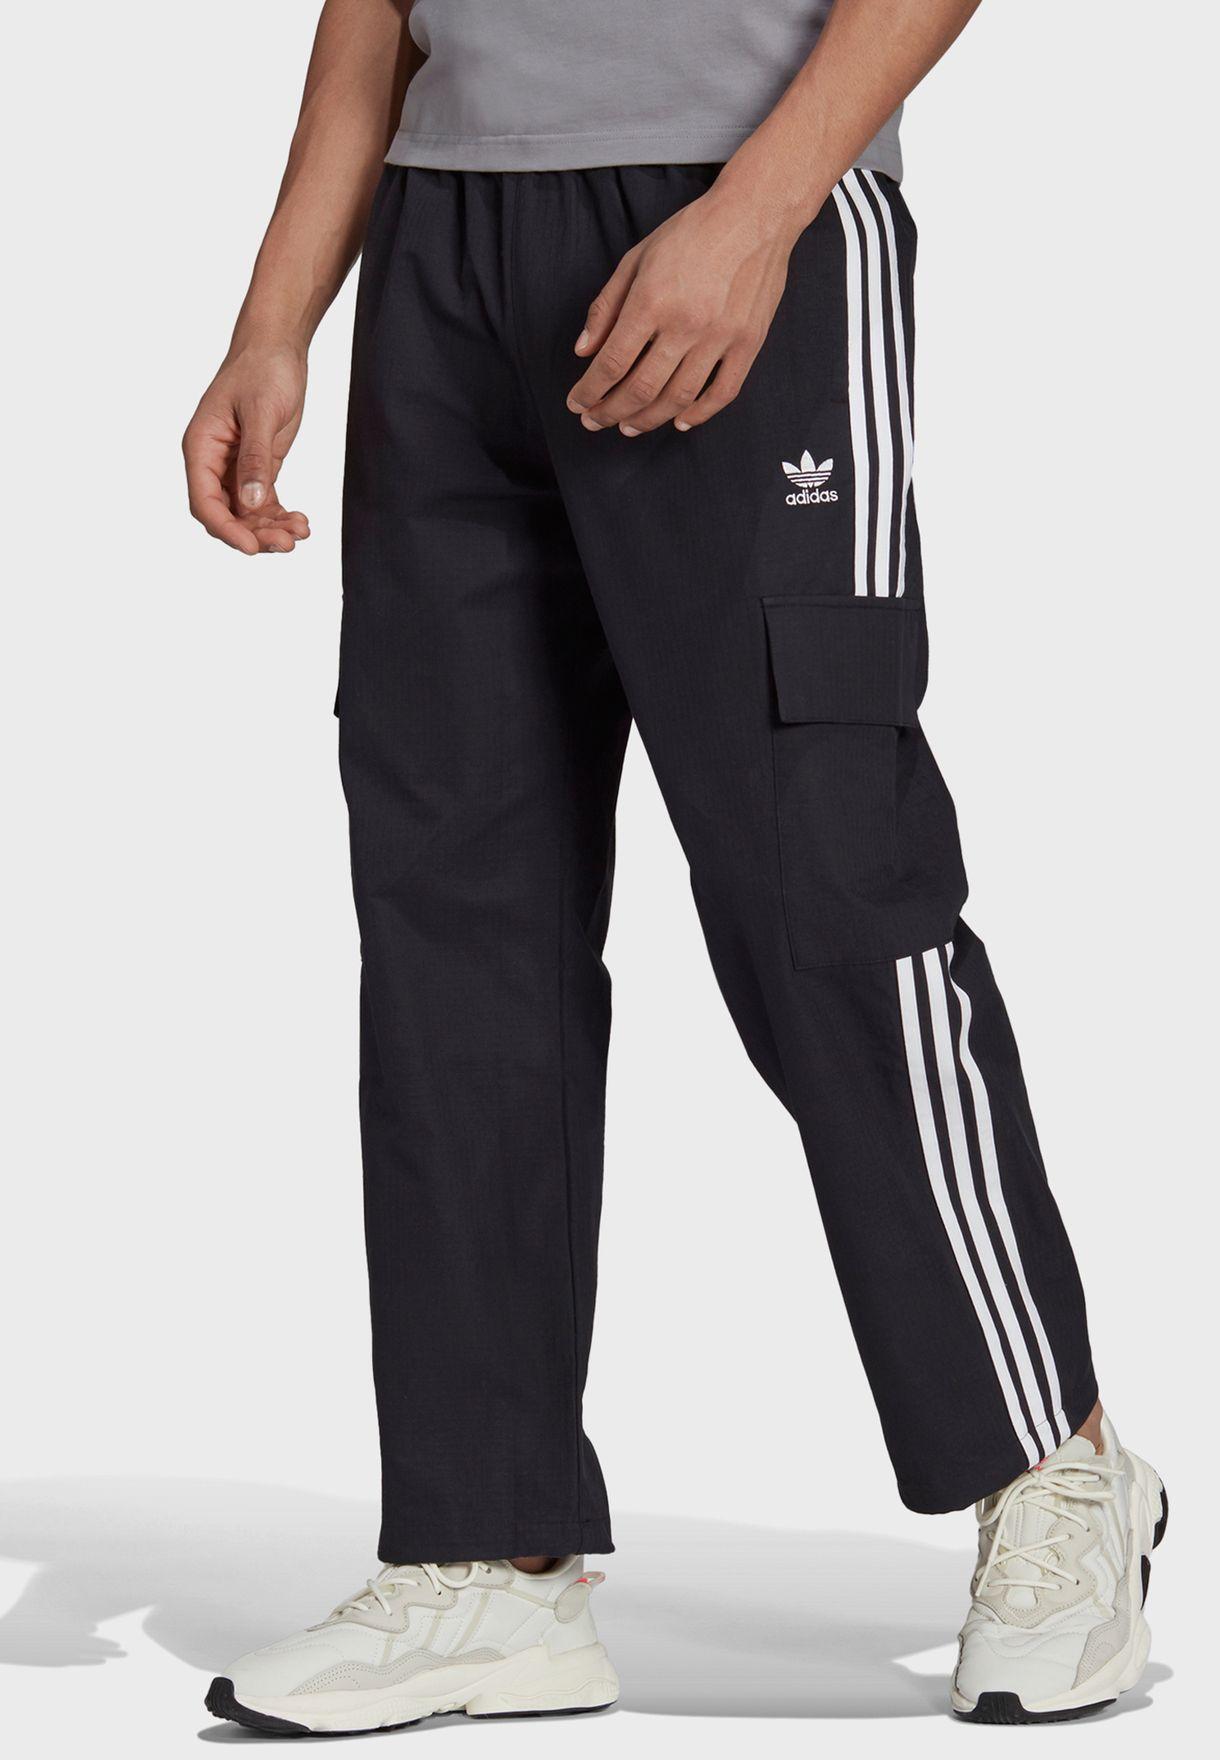 Adicolor 3 Stripe Sweatpants